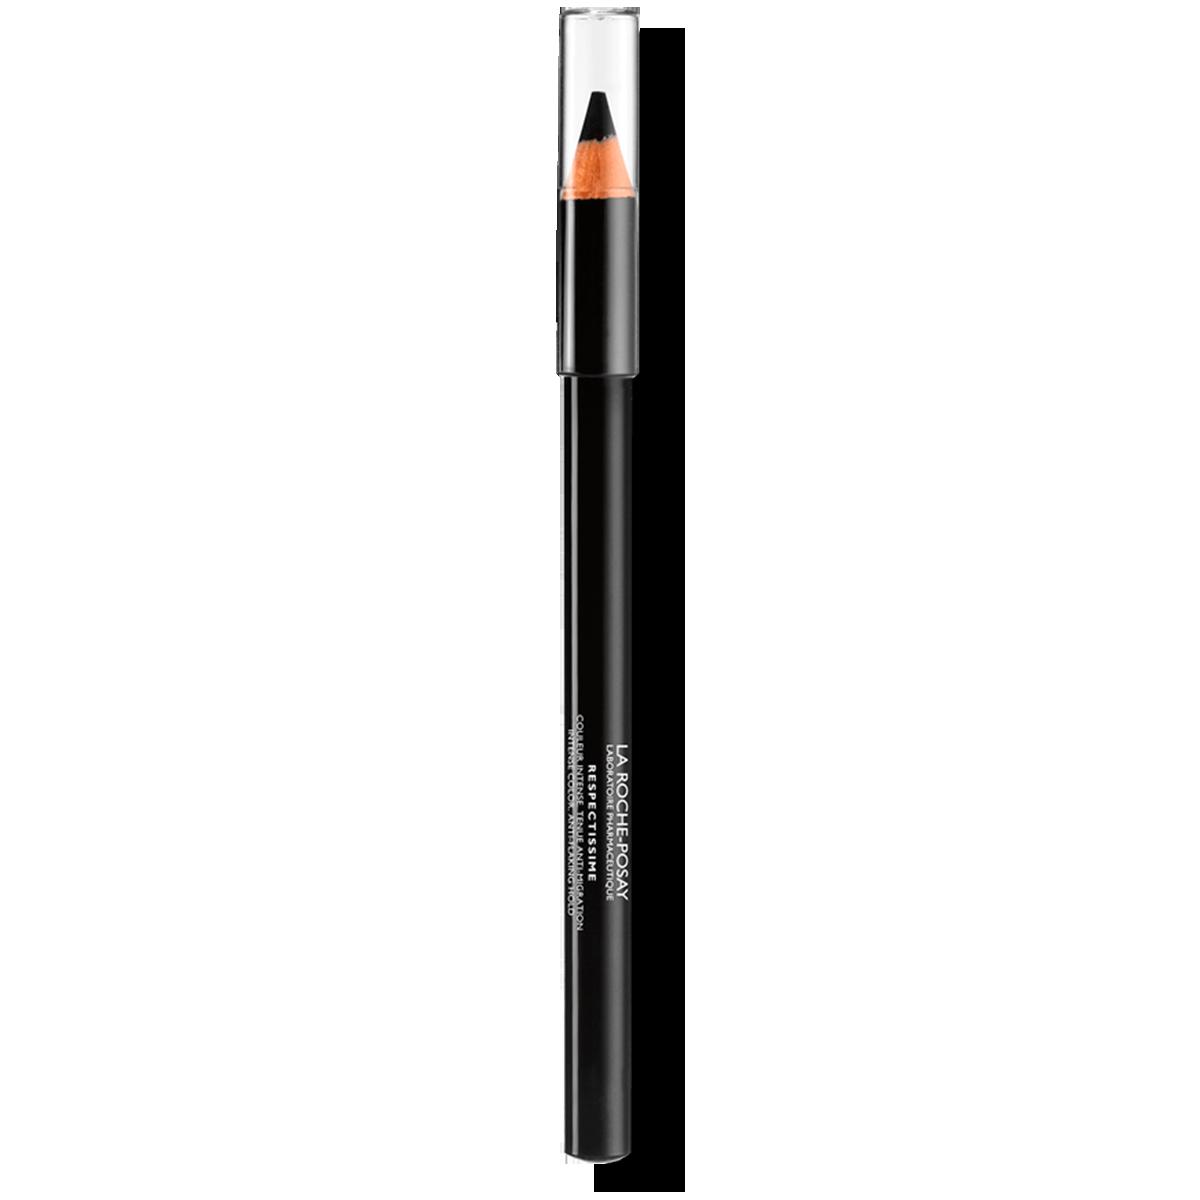 La Roche Posay Sensitive Toleriane Make up EYE_PENCIL Black 3337872410